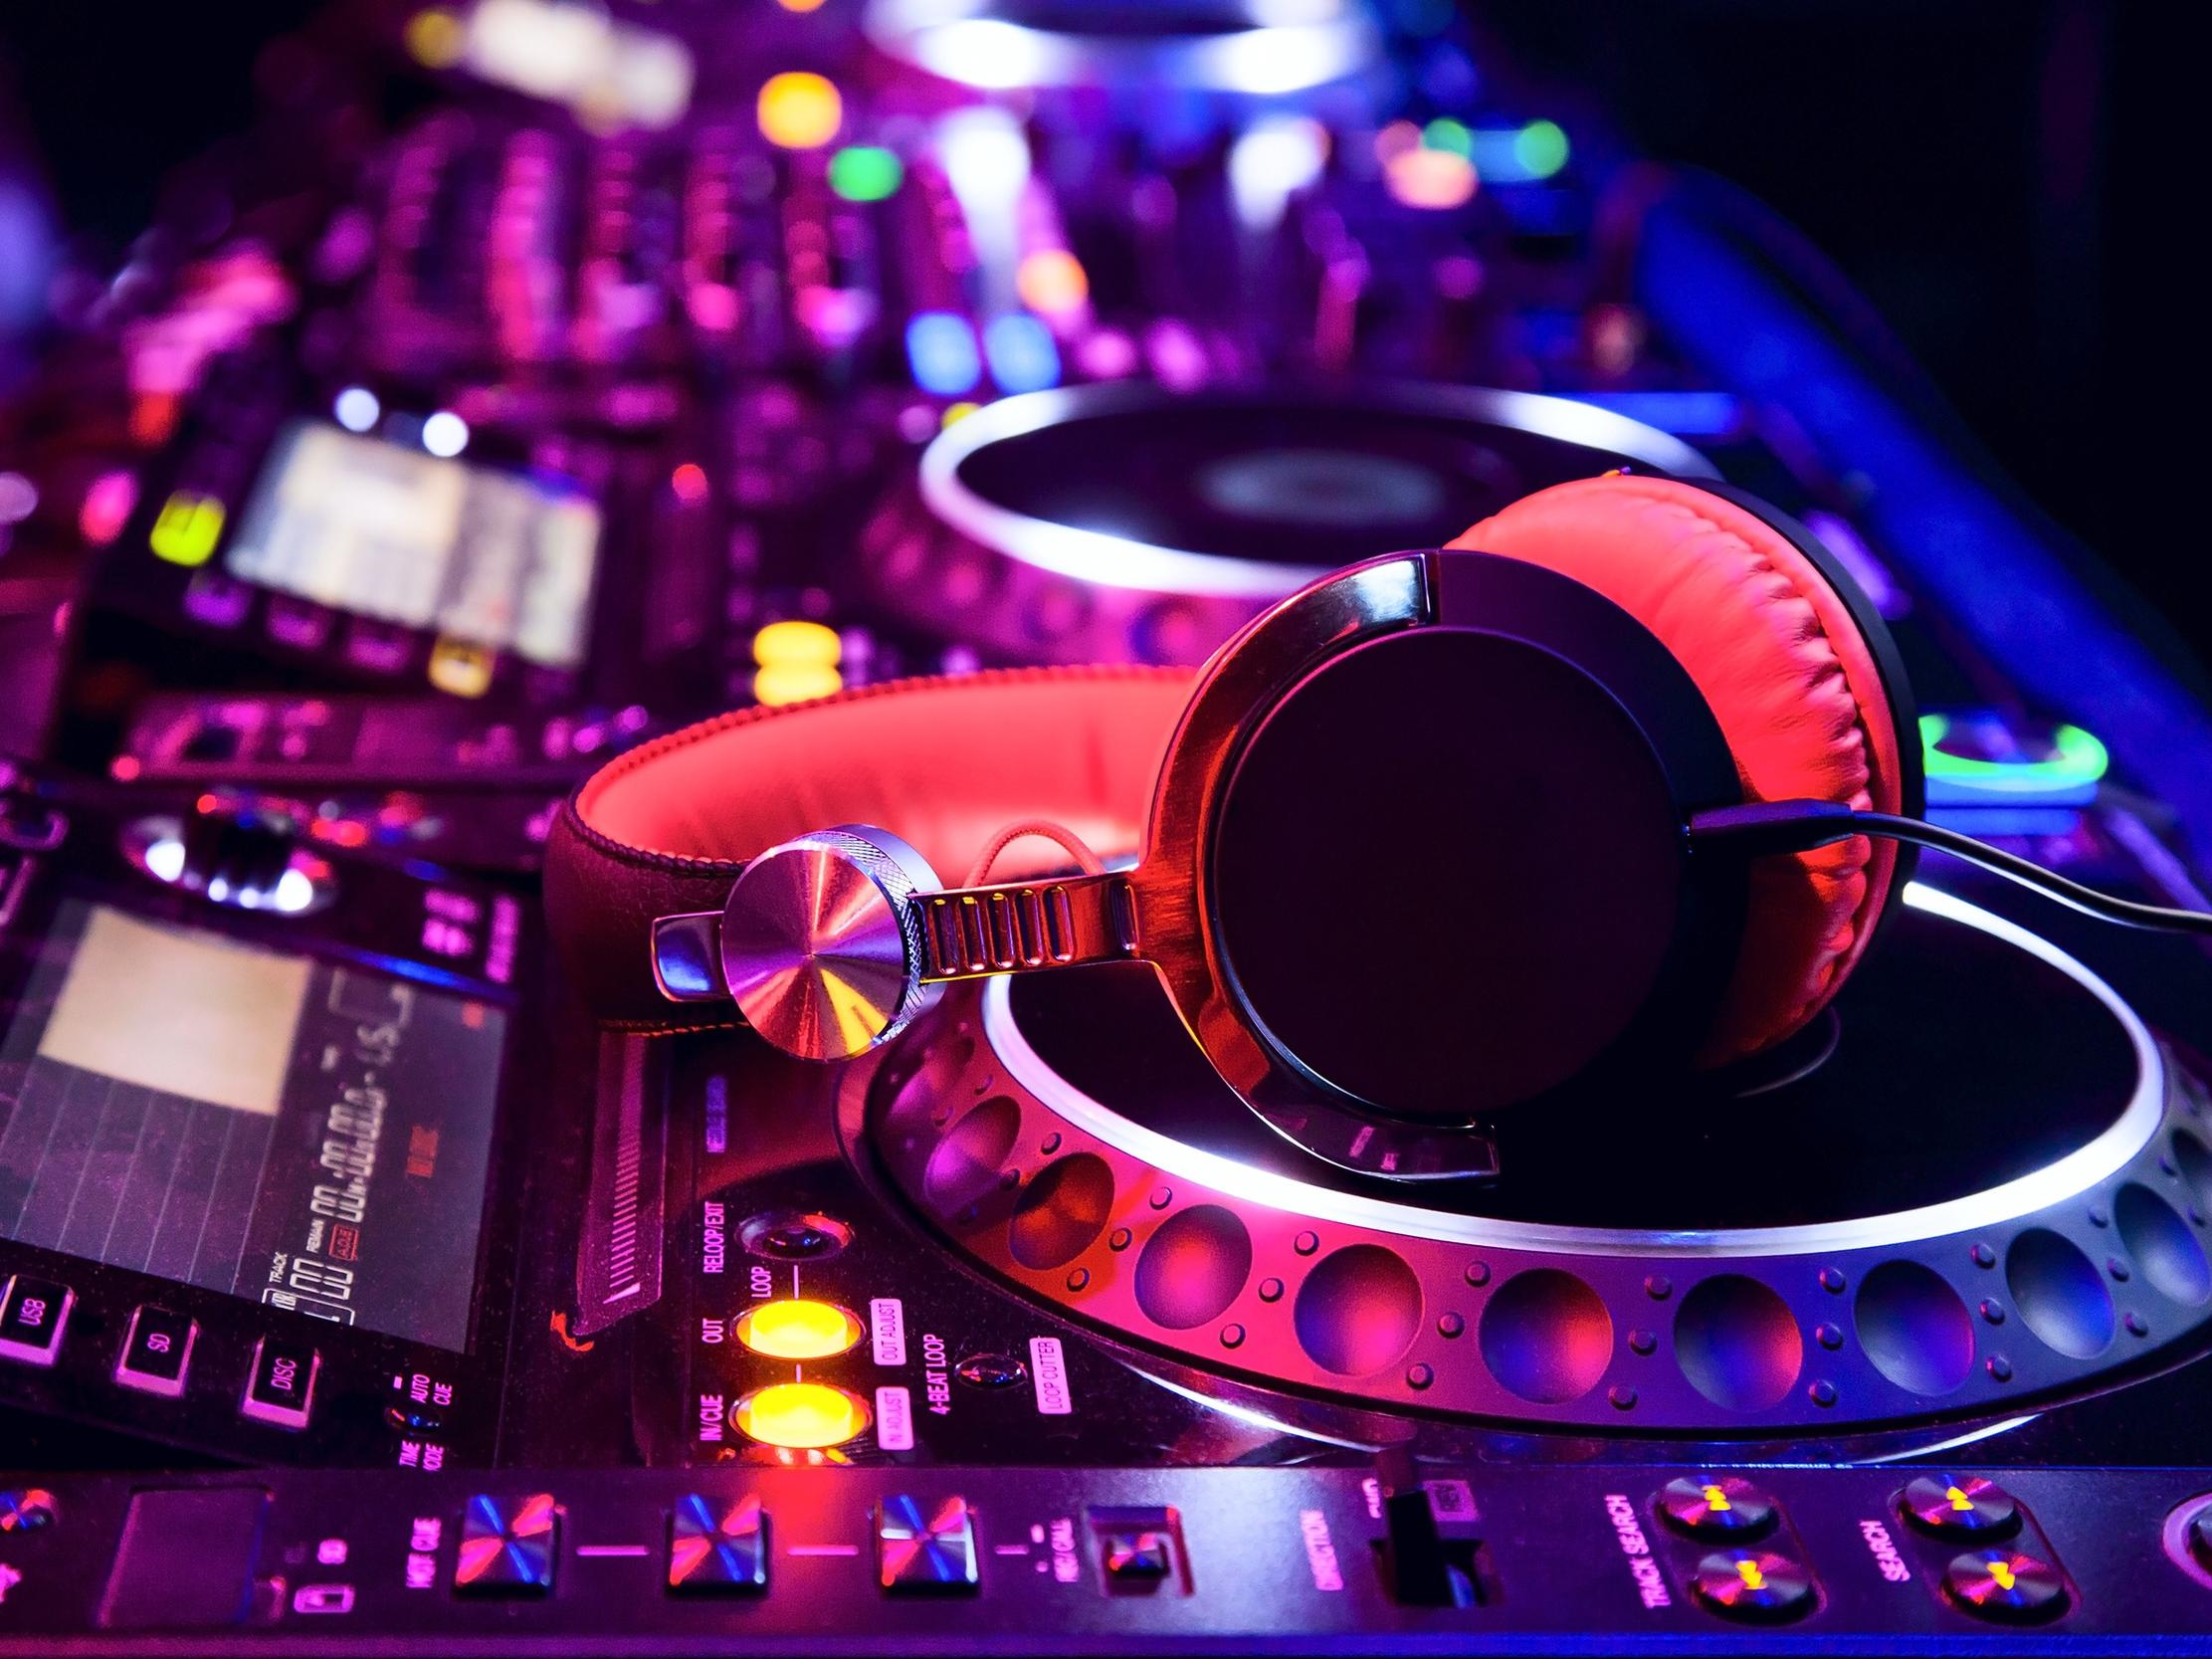 DJ - AdobeStock_45452813.jpeg